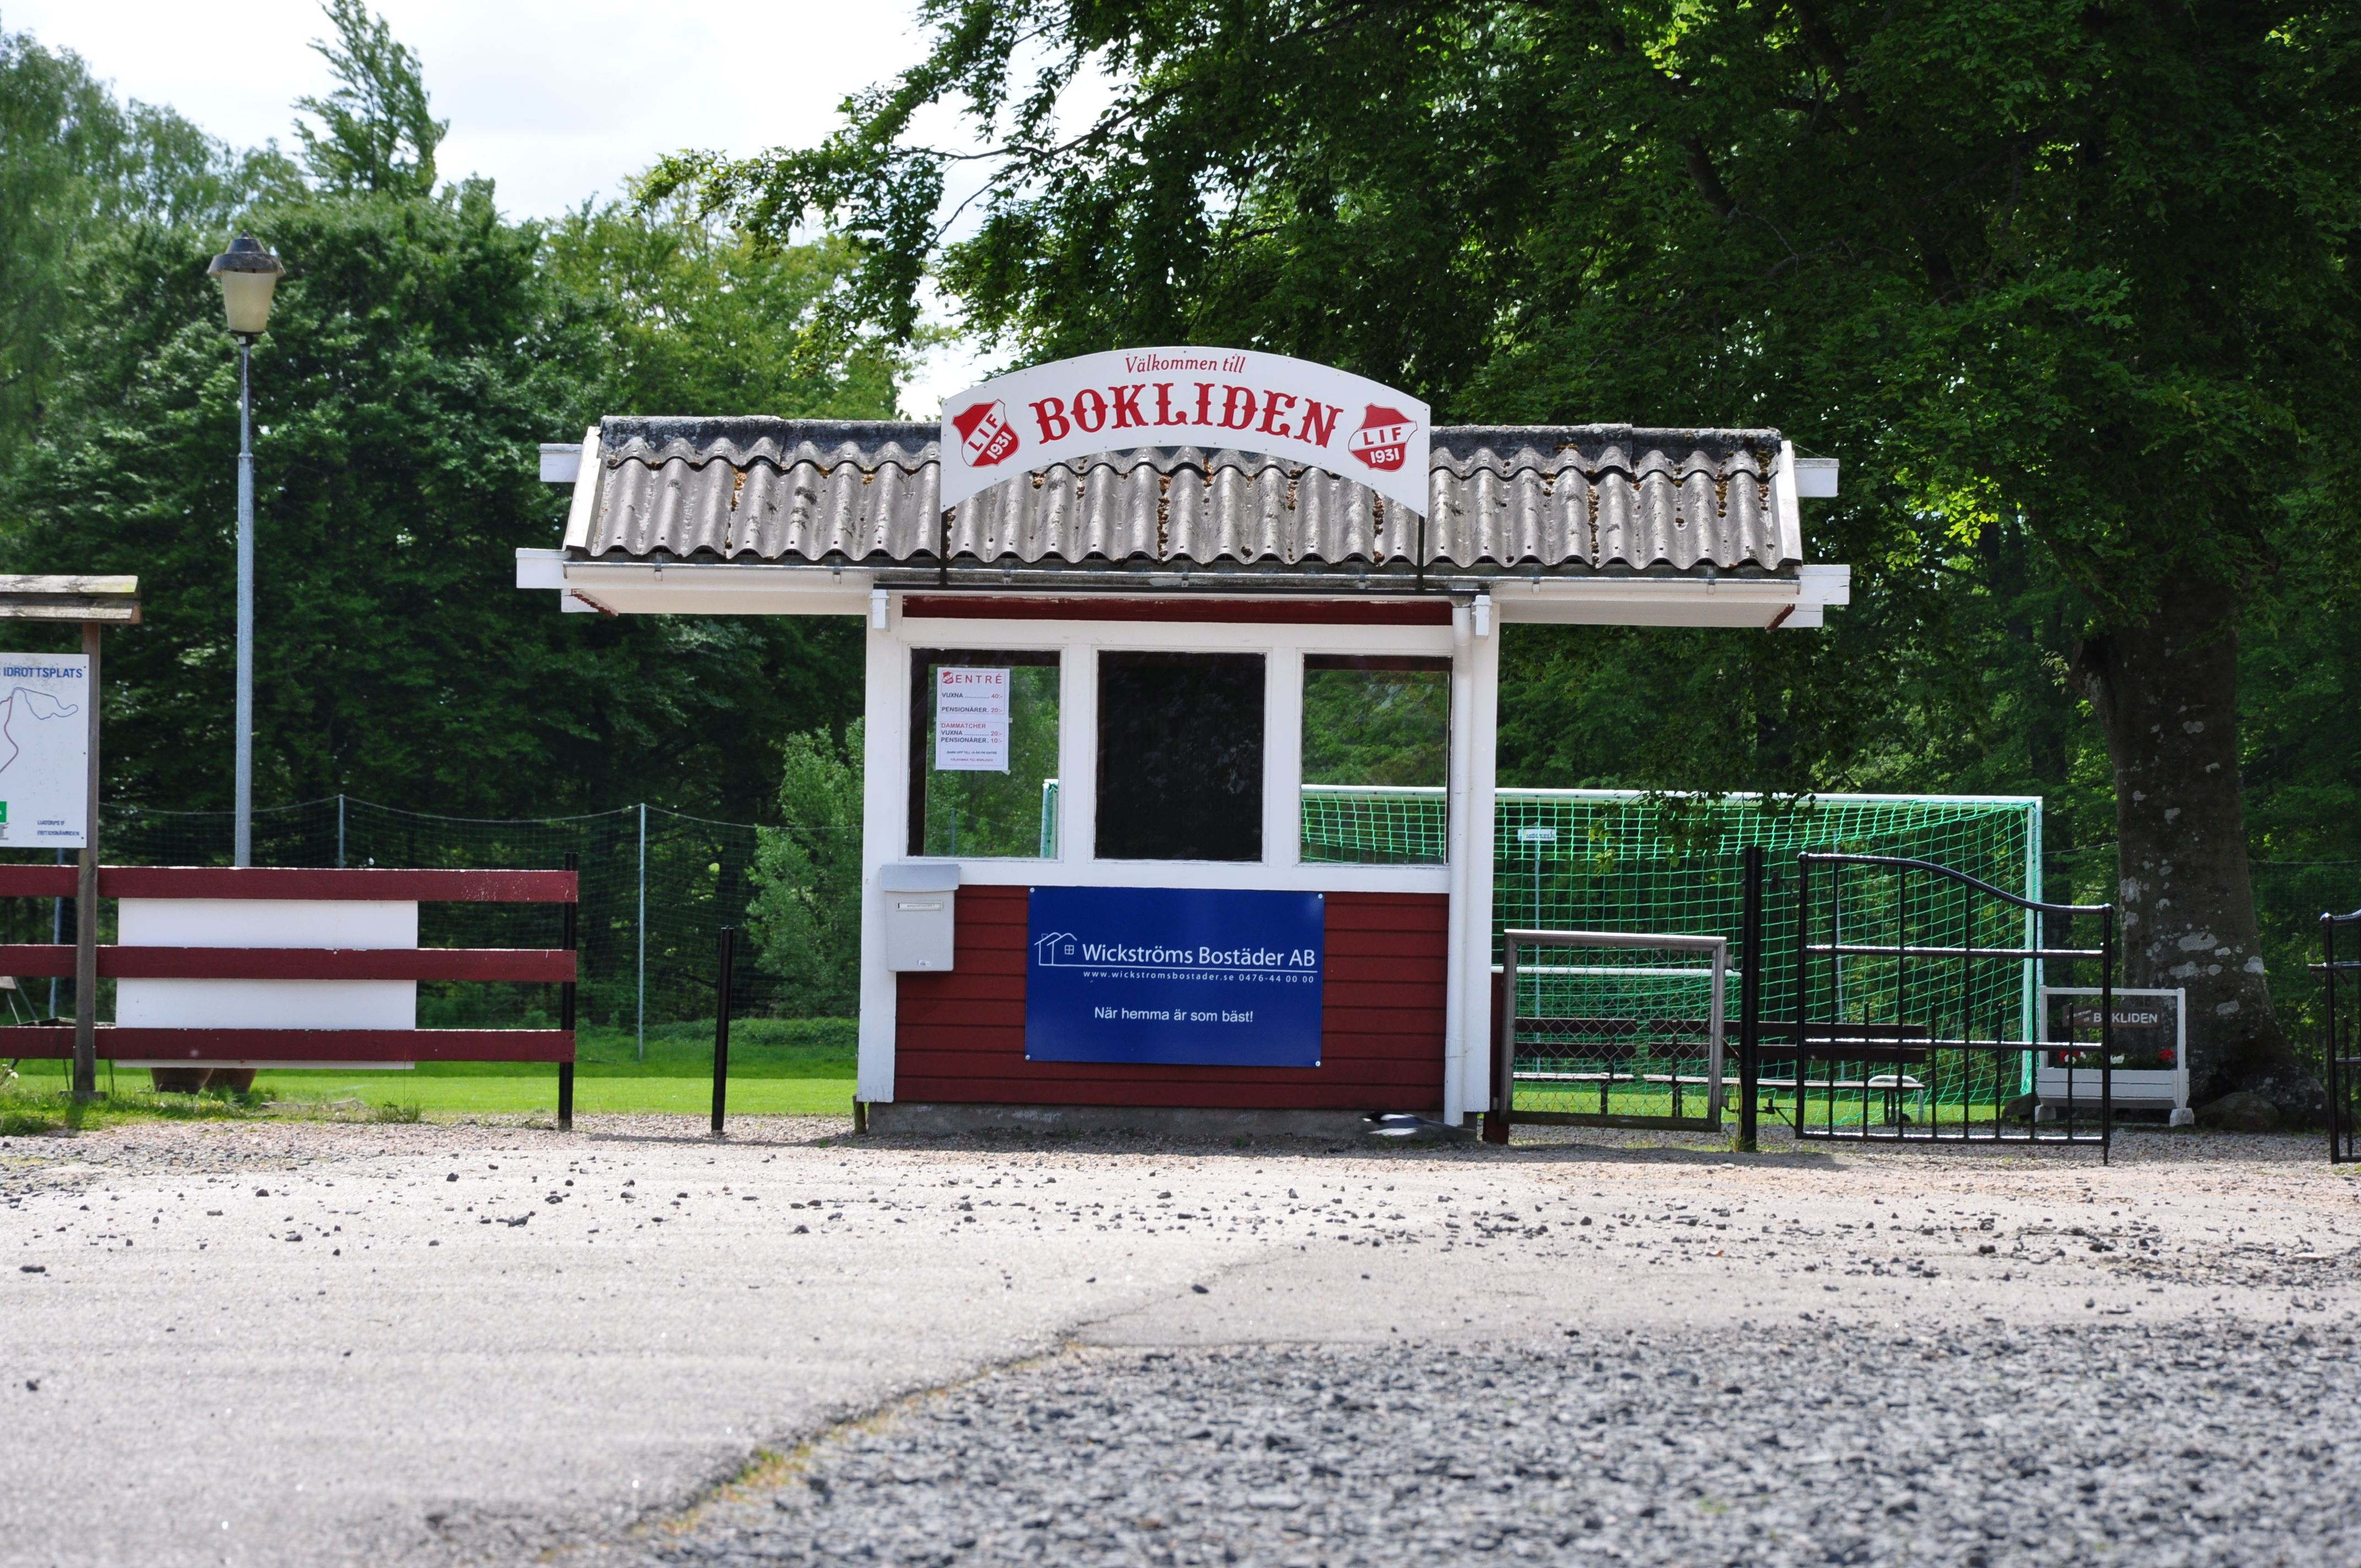 Sportplatz, Bokliden, Liatorp